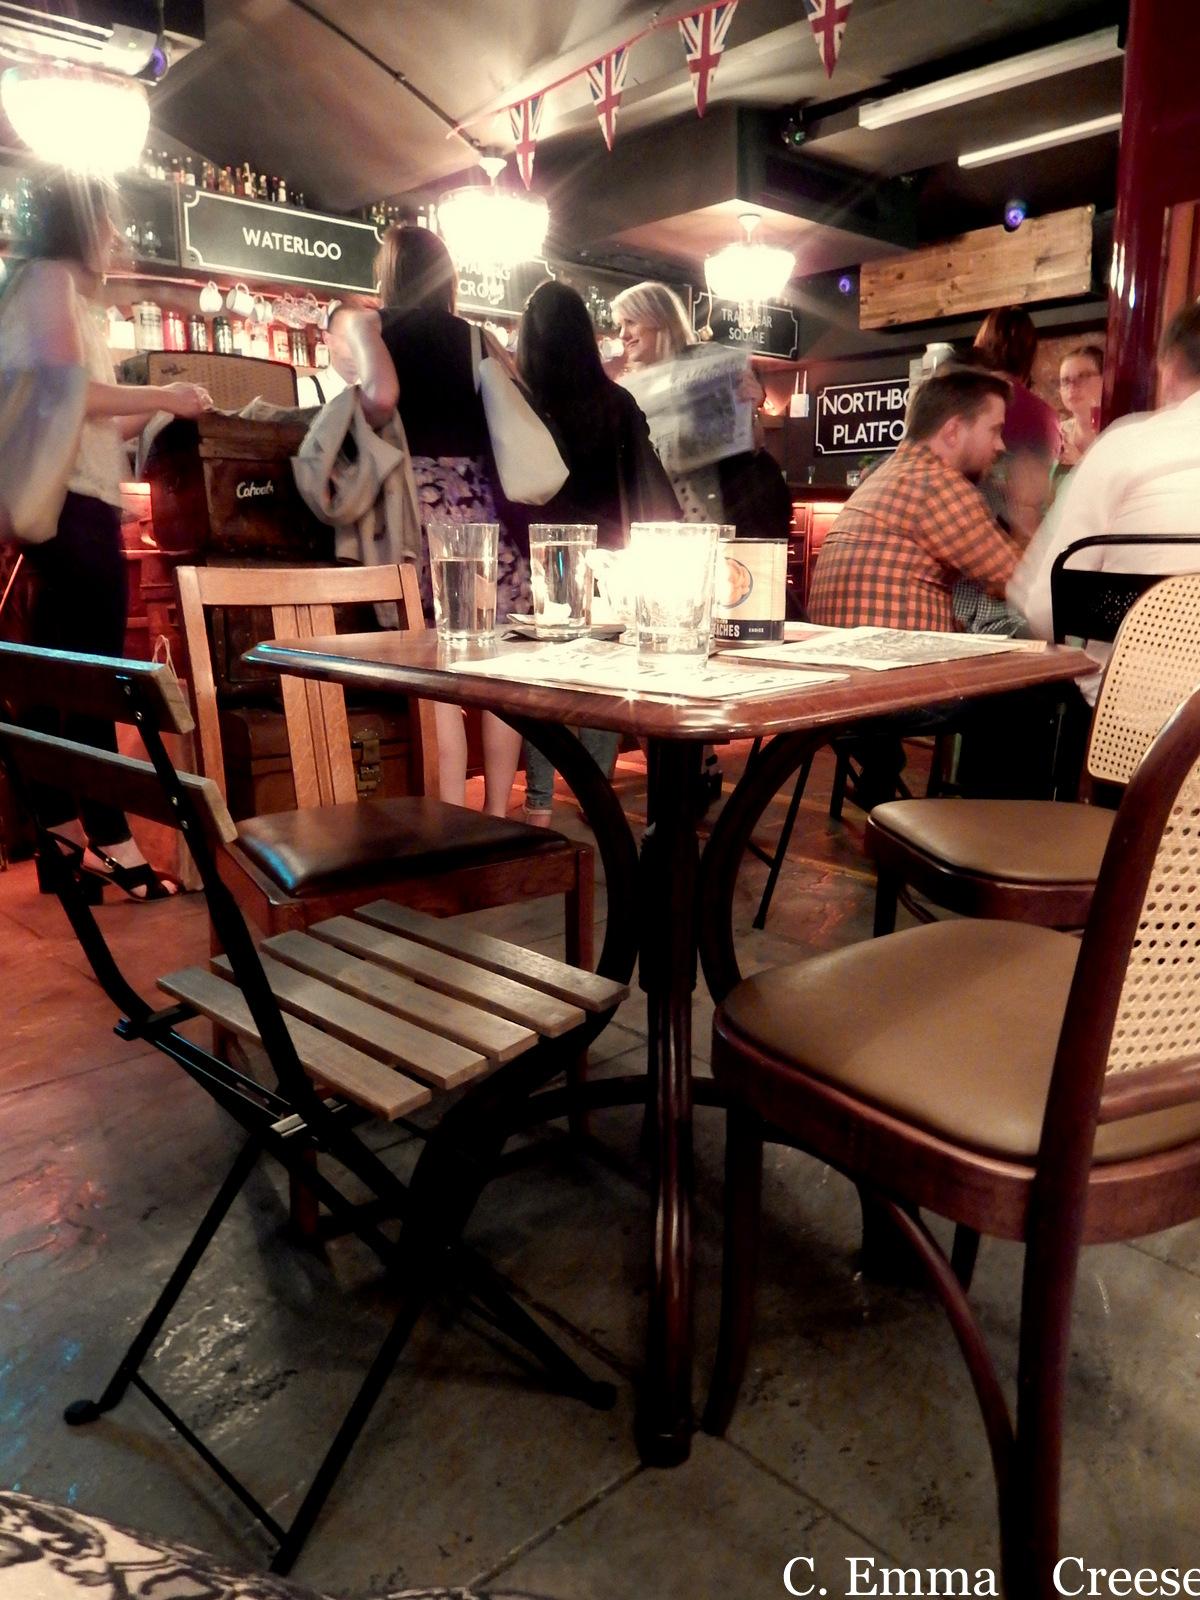 Cahoots, an Underground London Cocktail bar